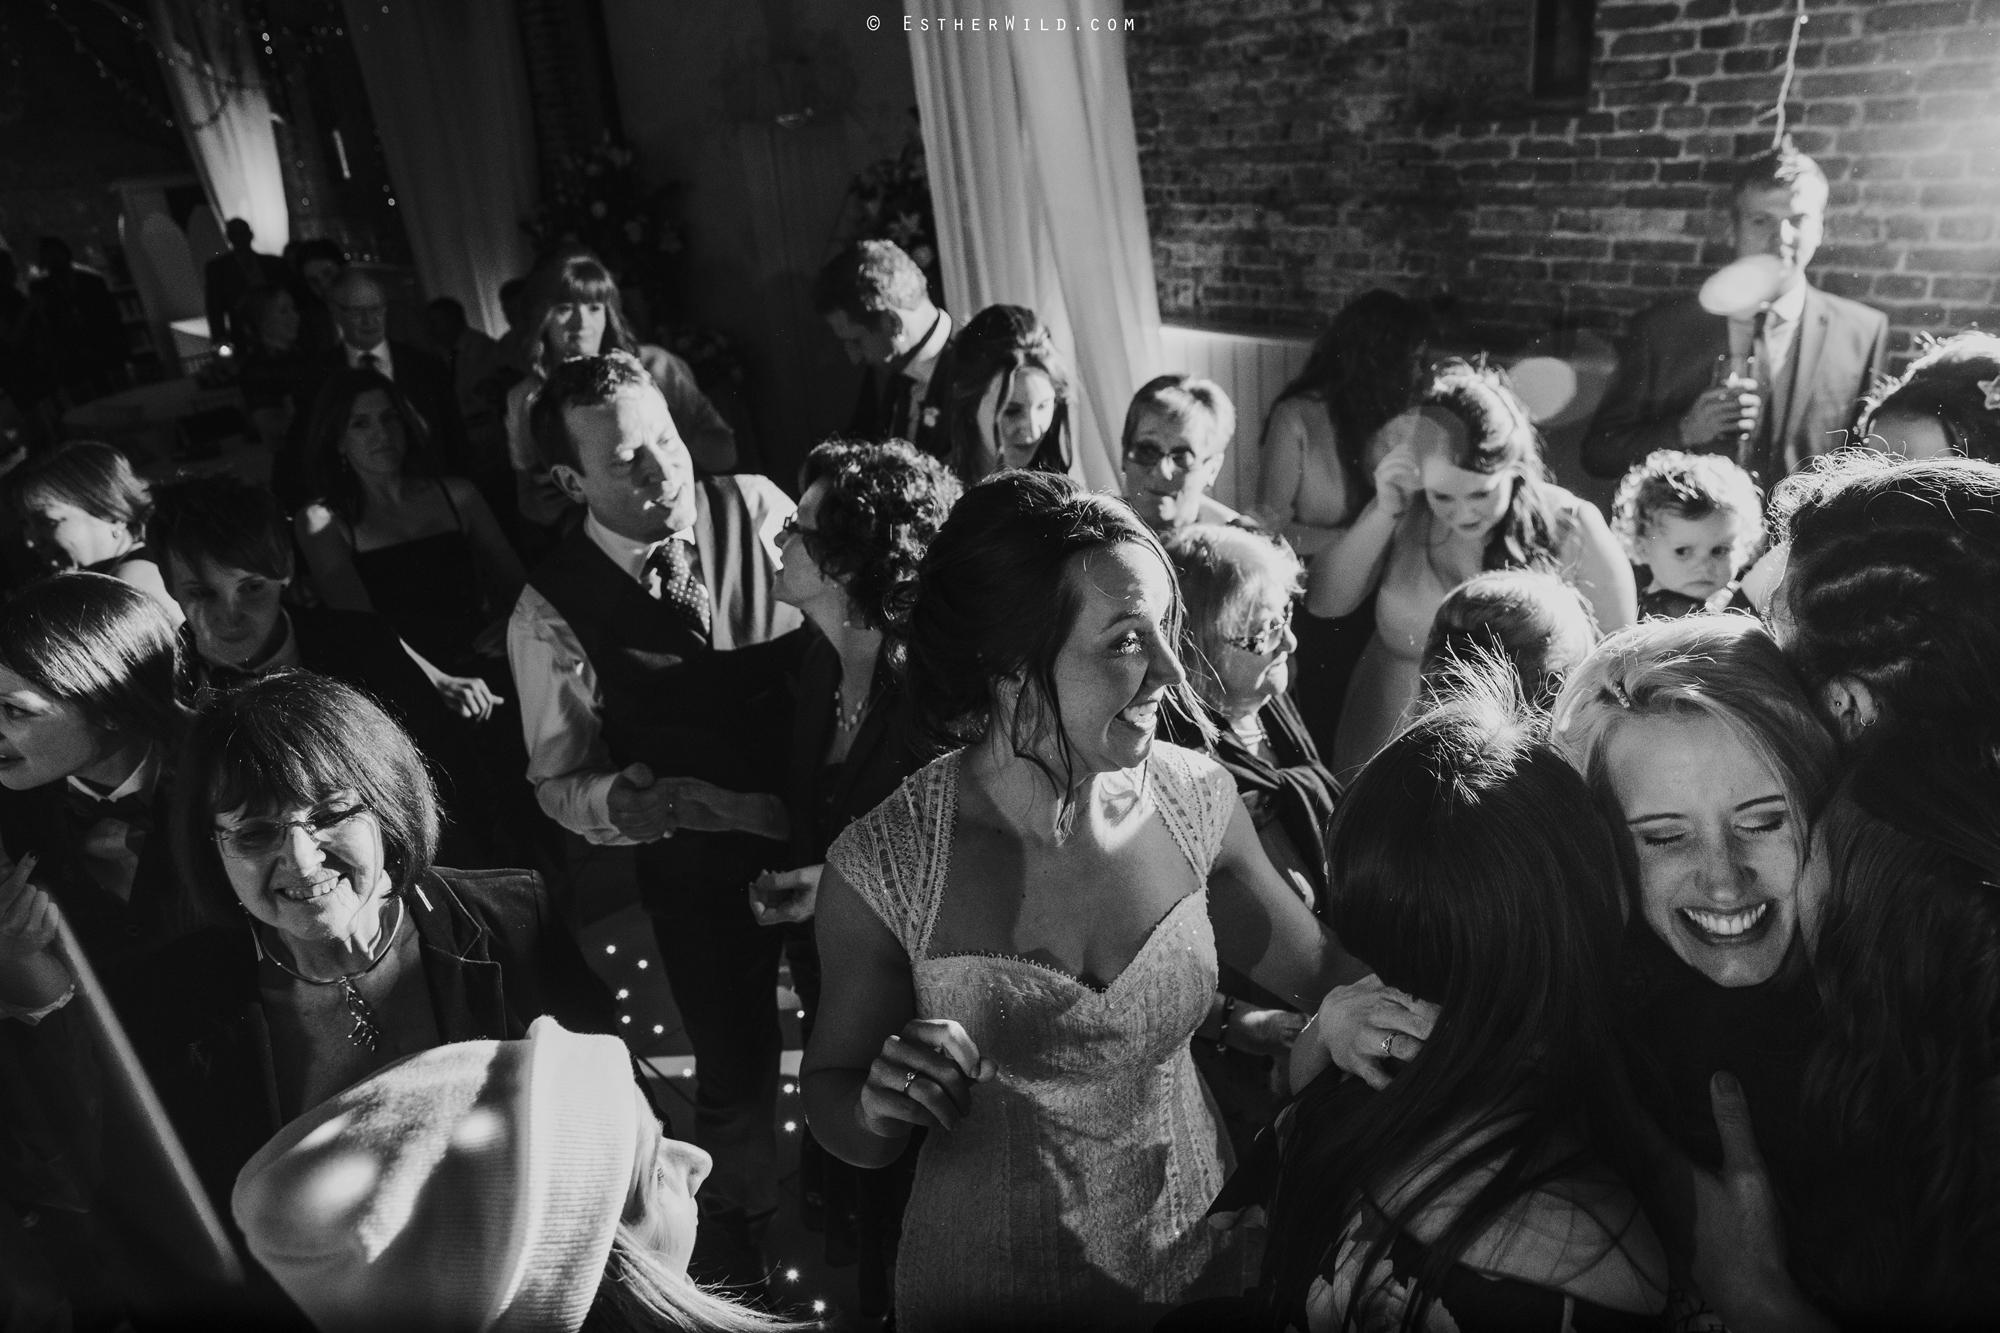 Elms_Barn_Weddings_Suffolk_Photographer_Copyright_Esther_Wild_IMG_3582-2.jpg